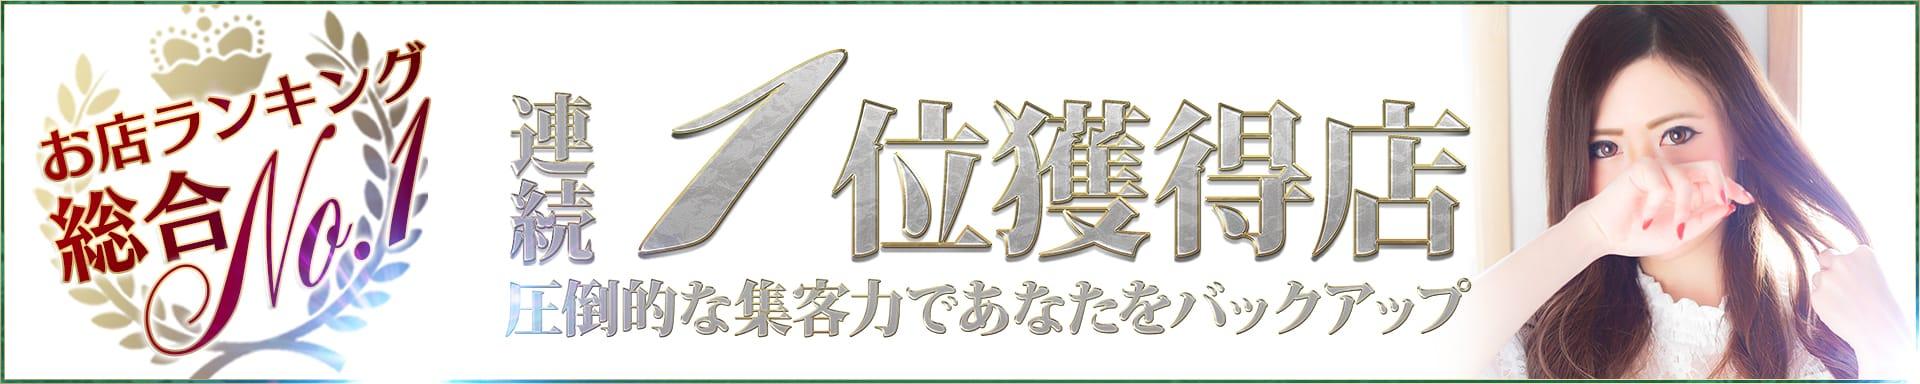 S級素人最高級デリバリーヘルス Platinum musee(プラチナムミュゼ) その2